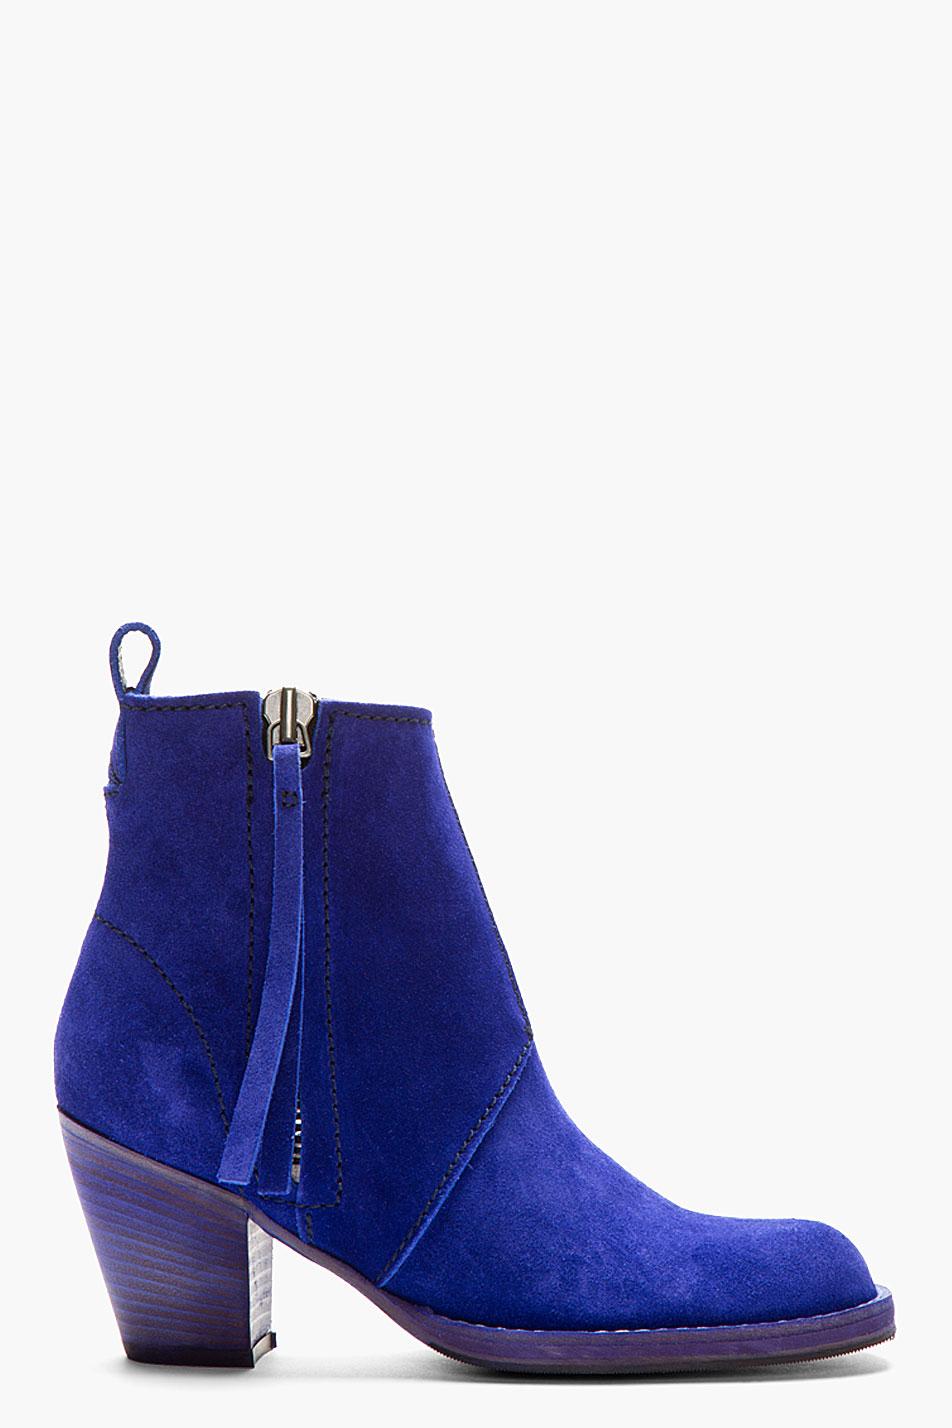 Acne Studios Indigo Blue Cuban Heel Suede Ankle Boot Lyst